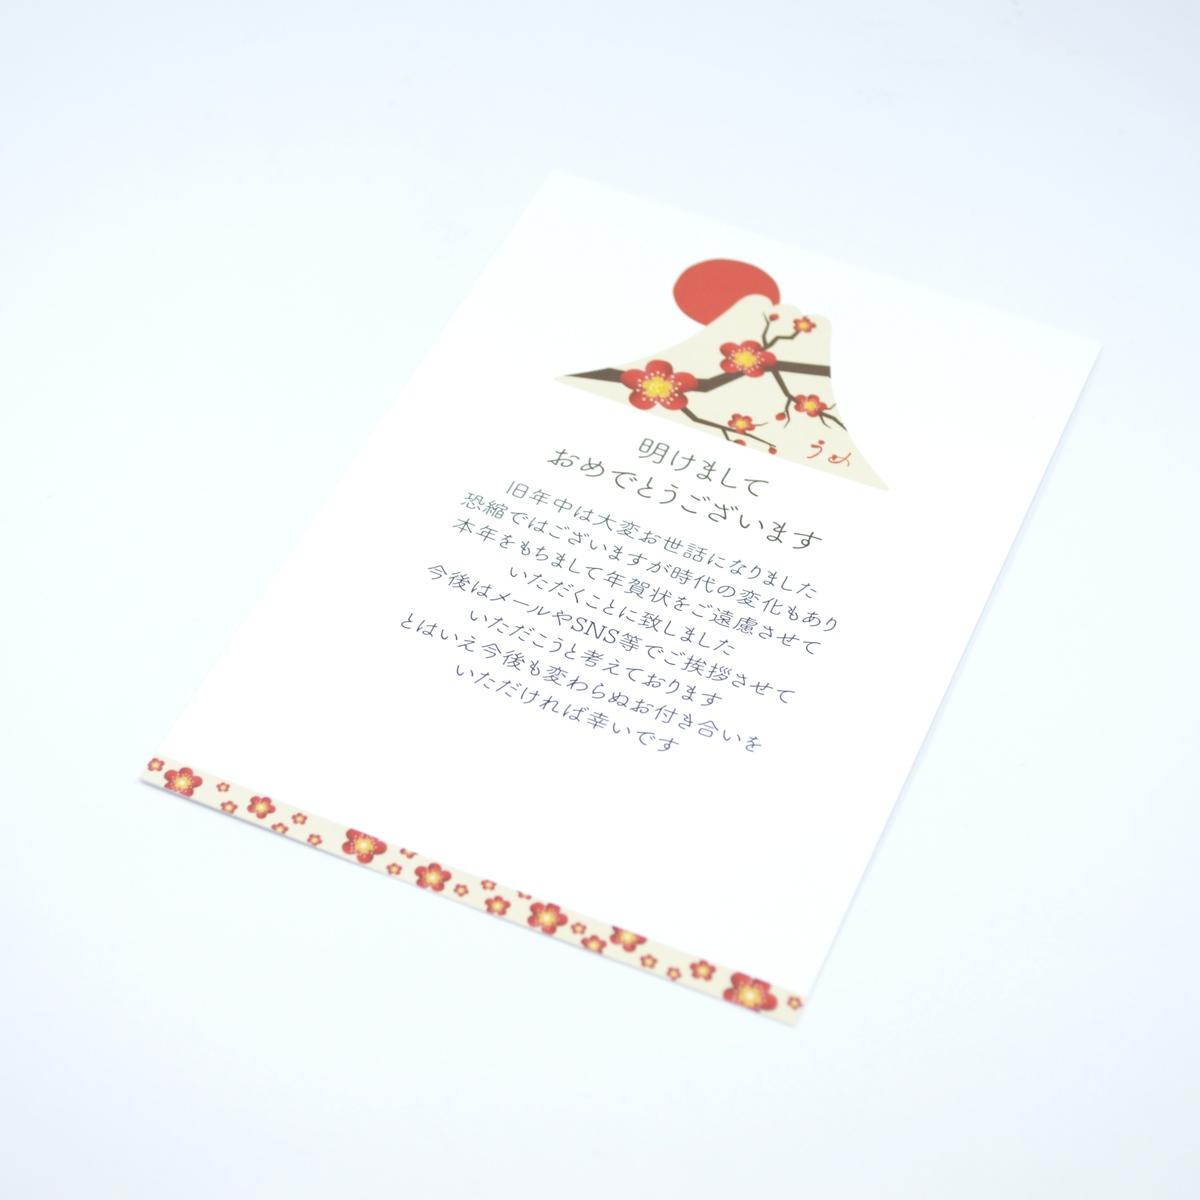 終活年賀状 富士山と梅 fpc-573